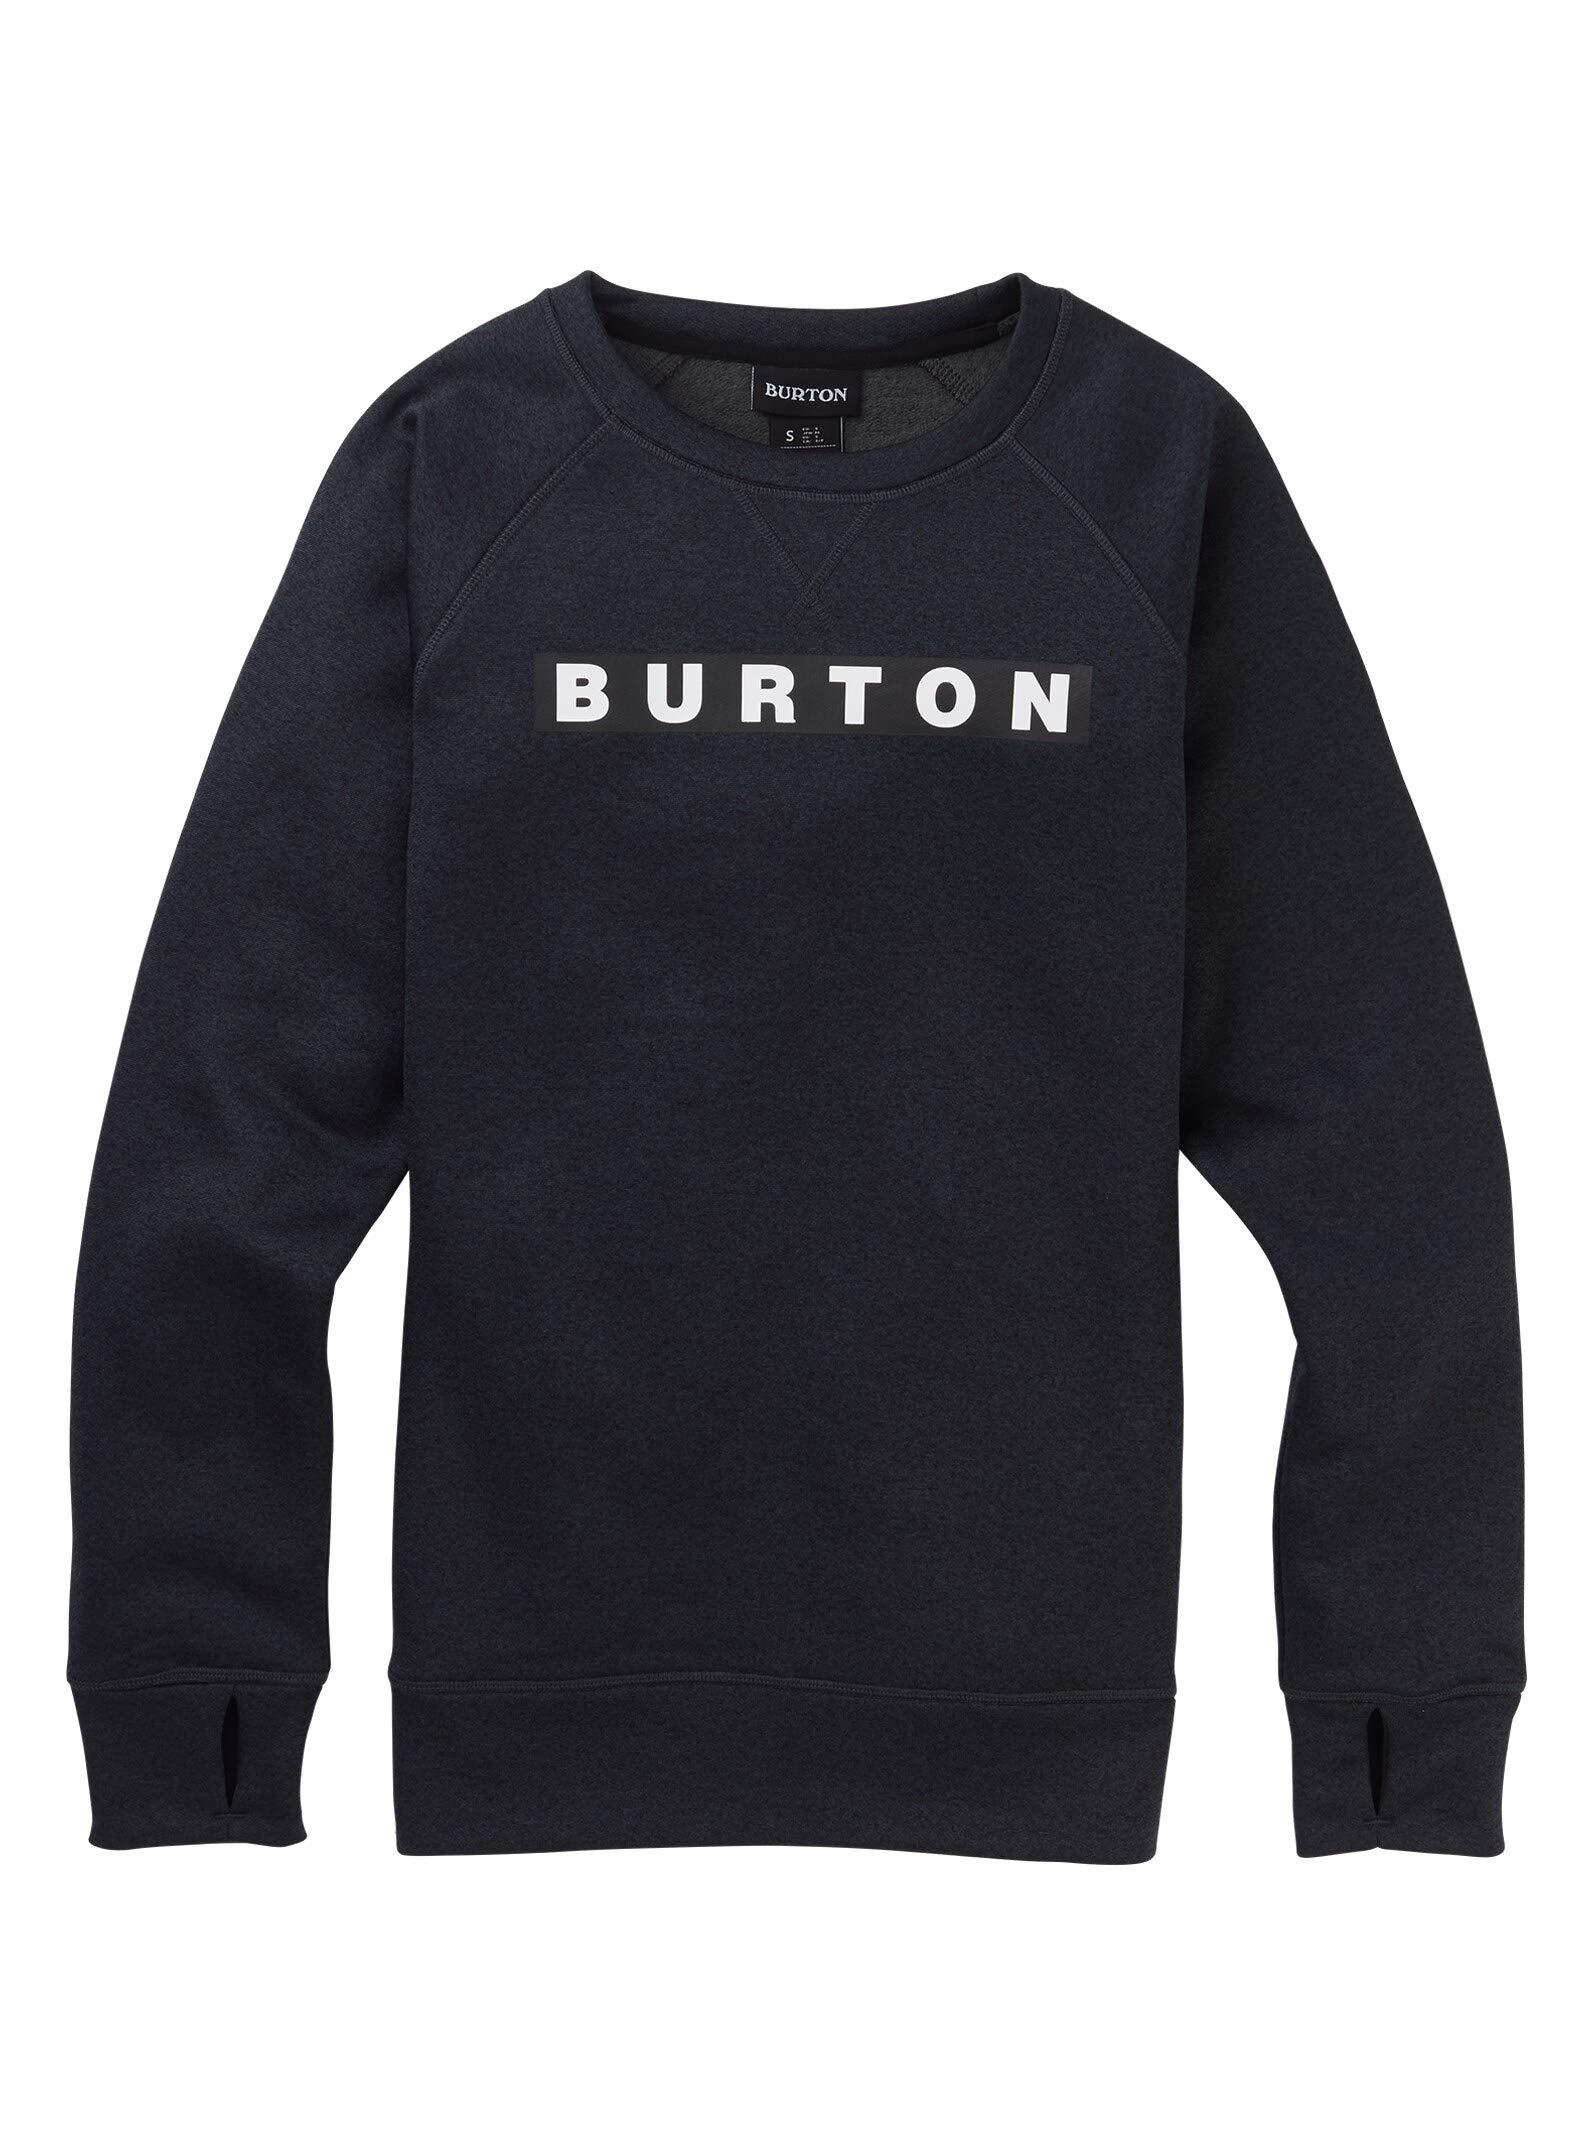 Burton Women's Oak Crew Sweatshirt, True Black Heather, X-Large by Burton